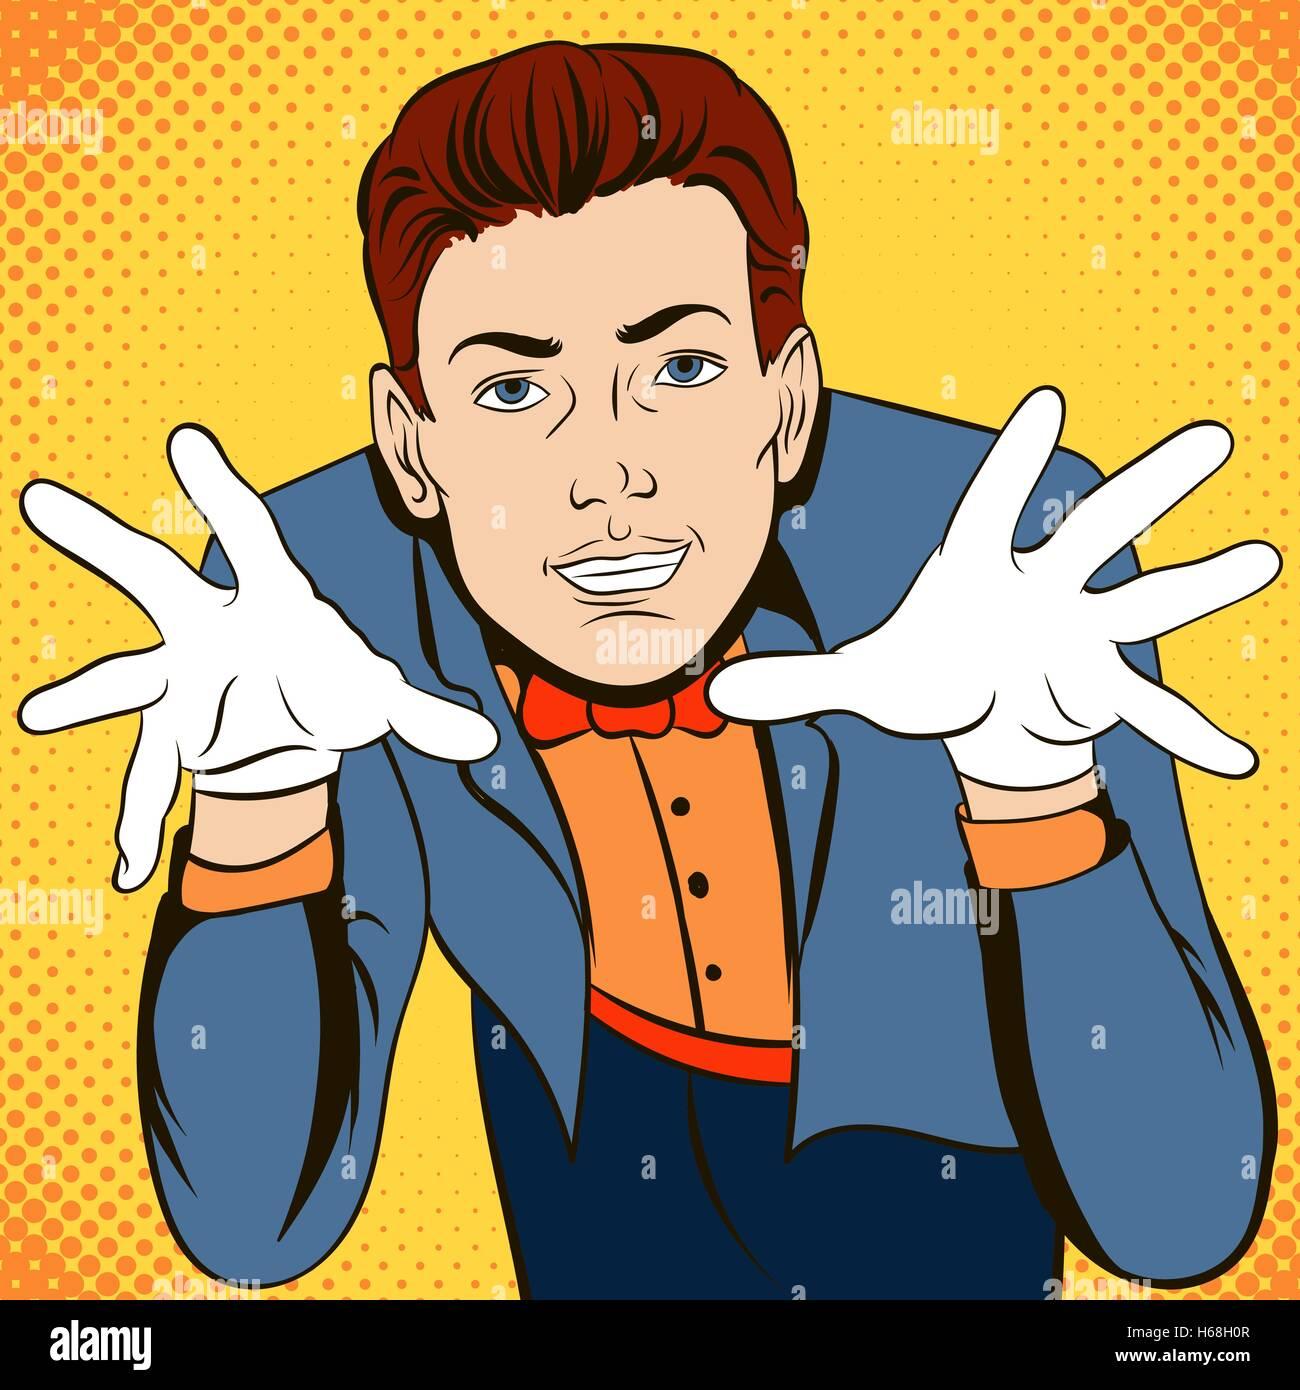 Hypnosis comics concept - Stock Image